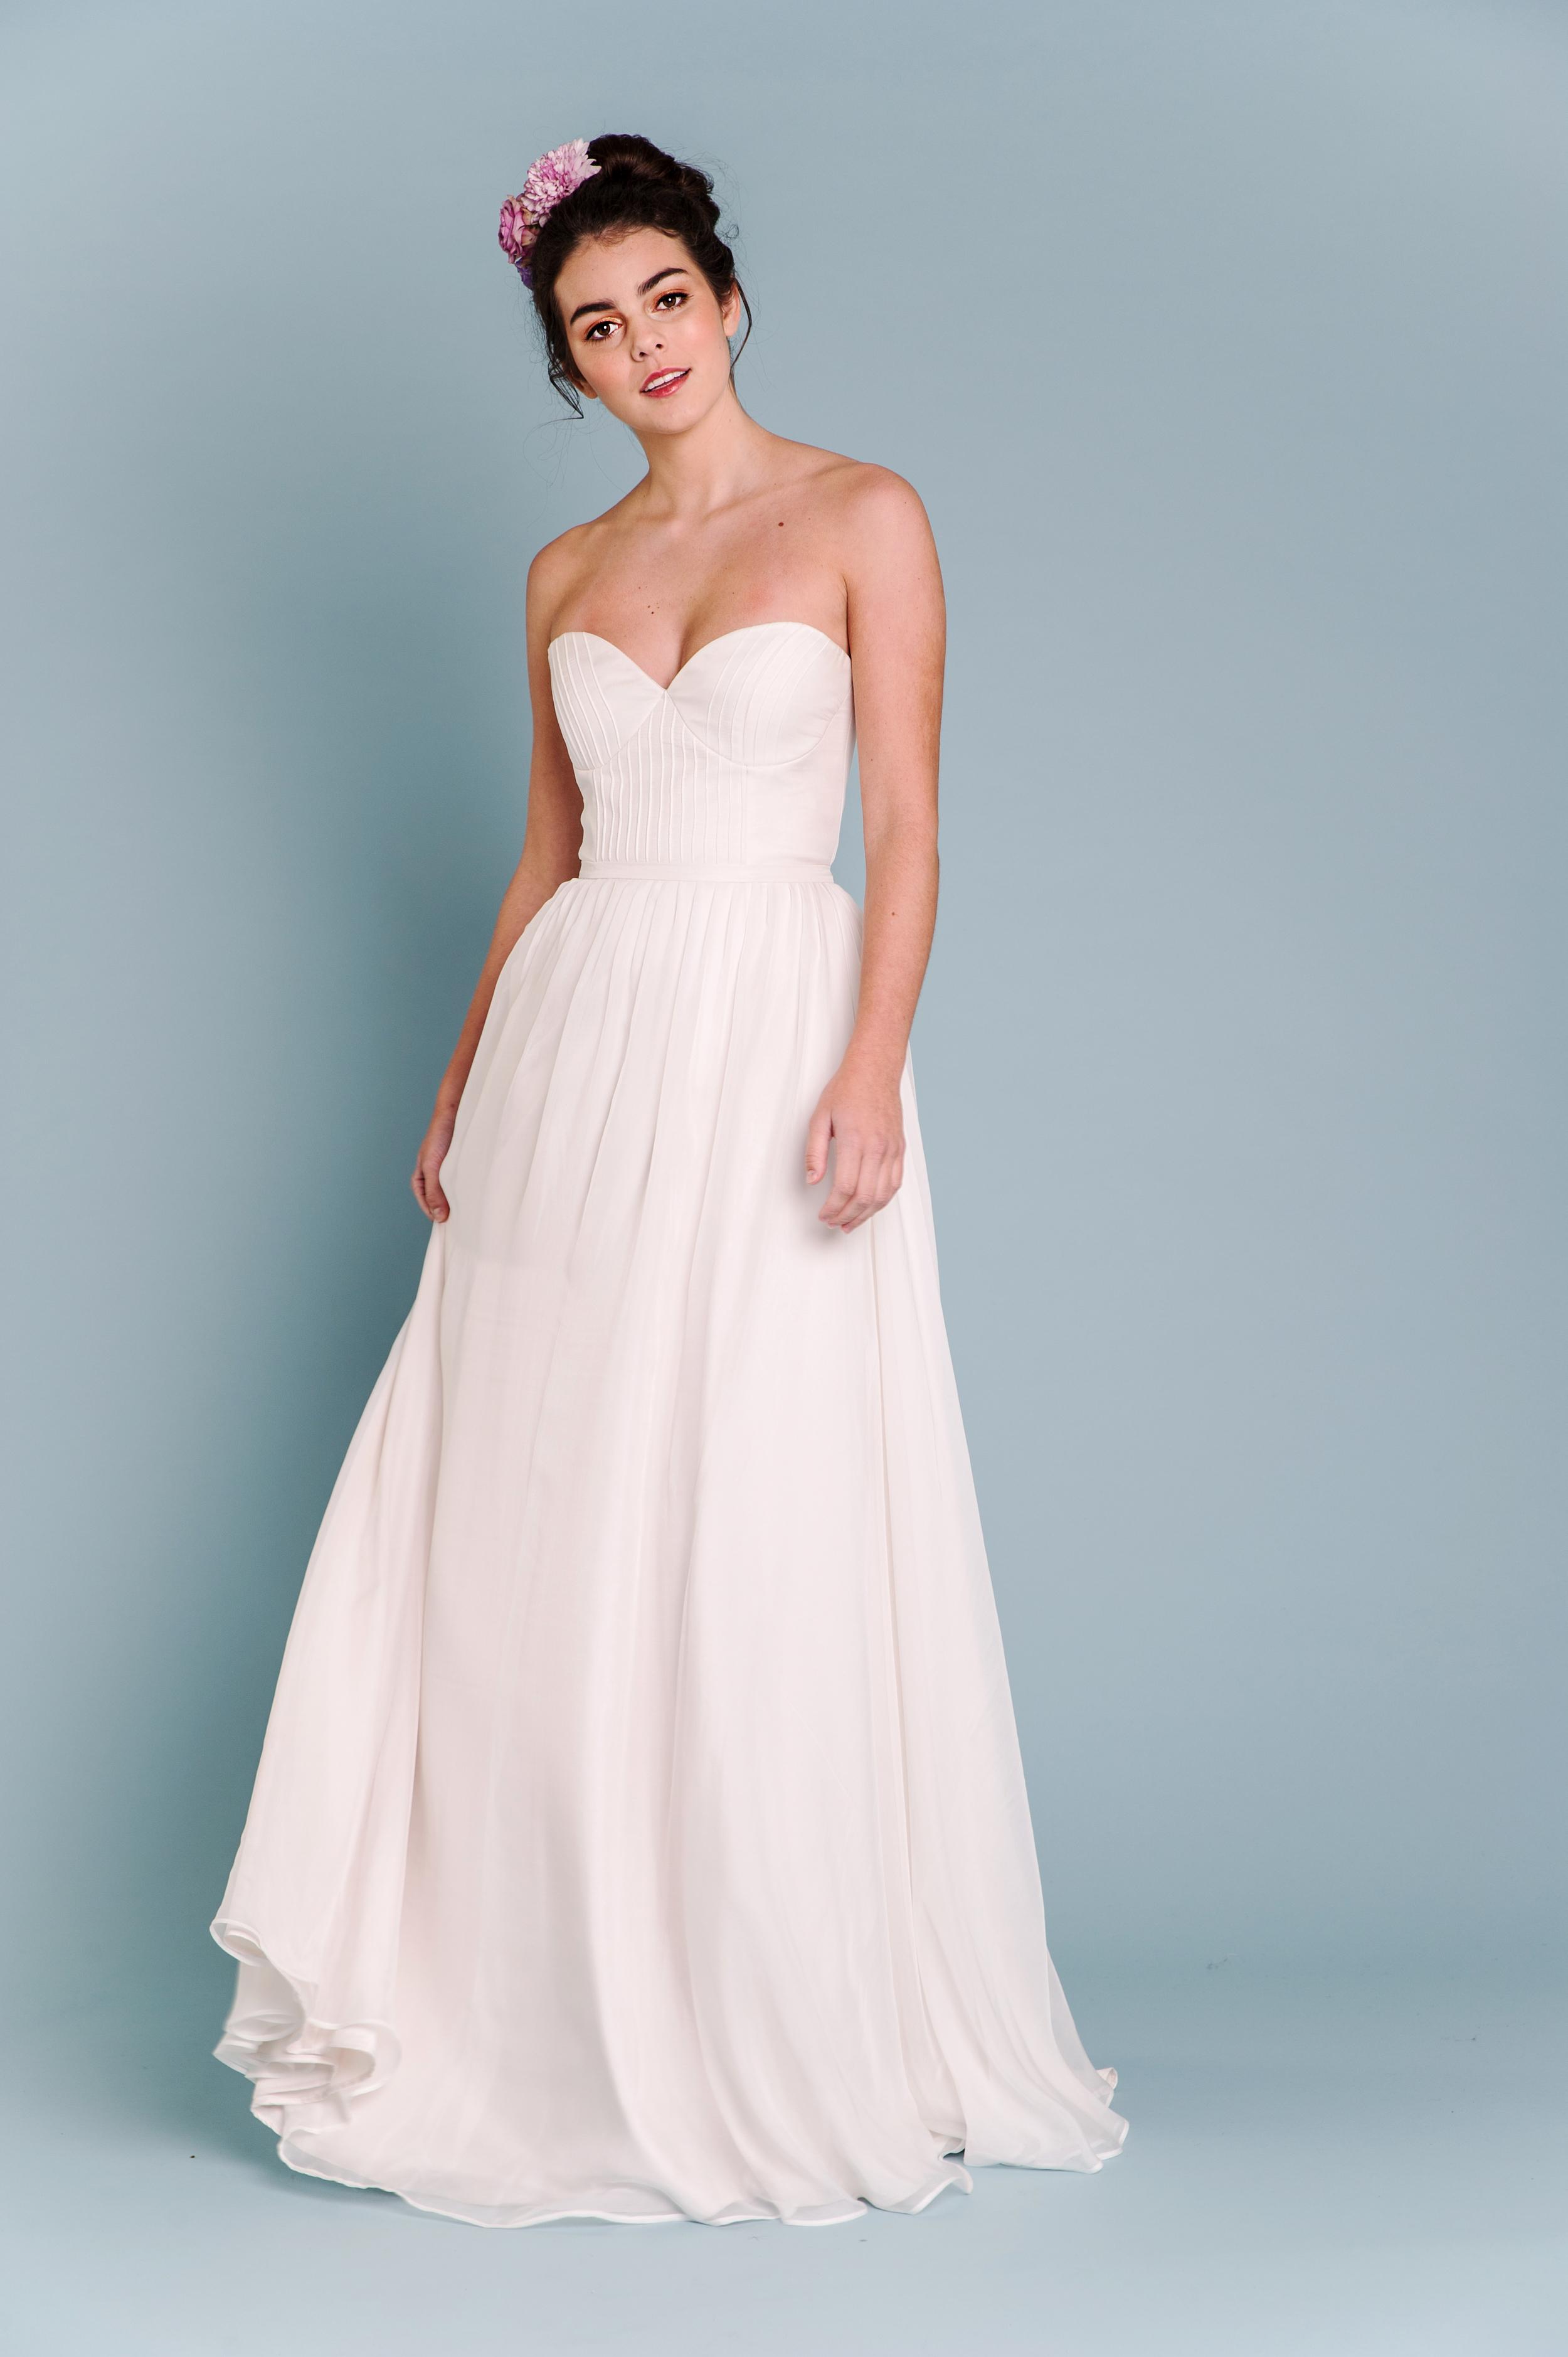 New Wedding Dresses Online Qld | Wedding